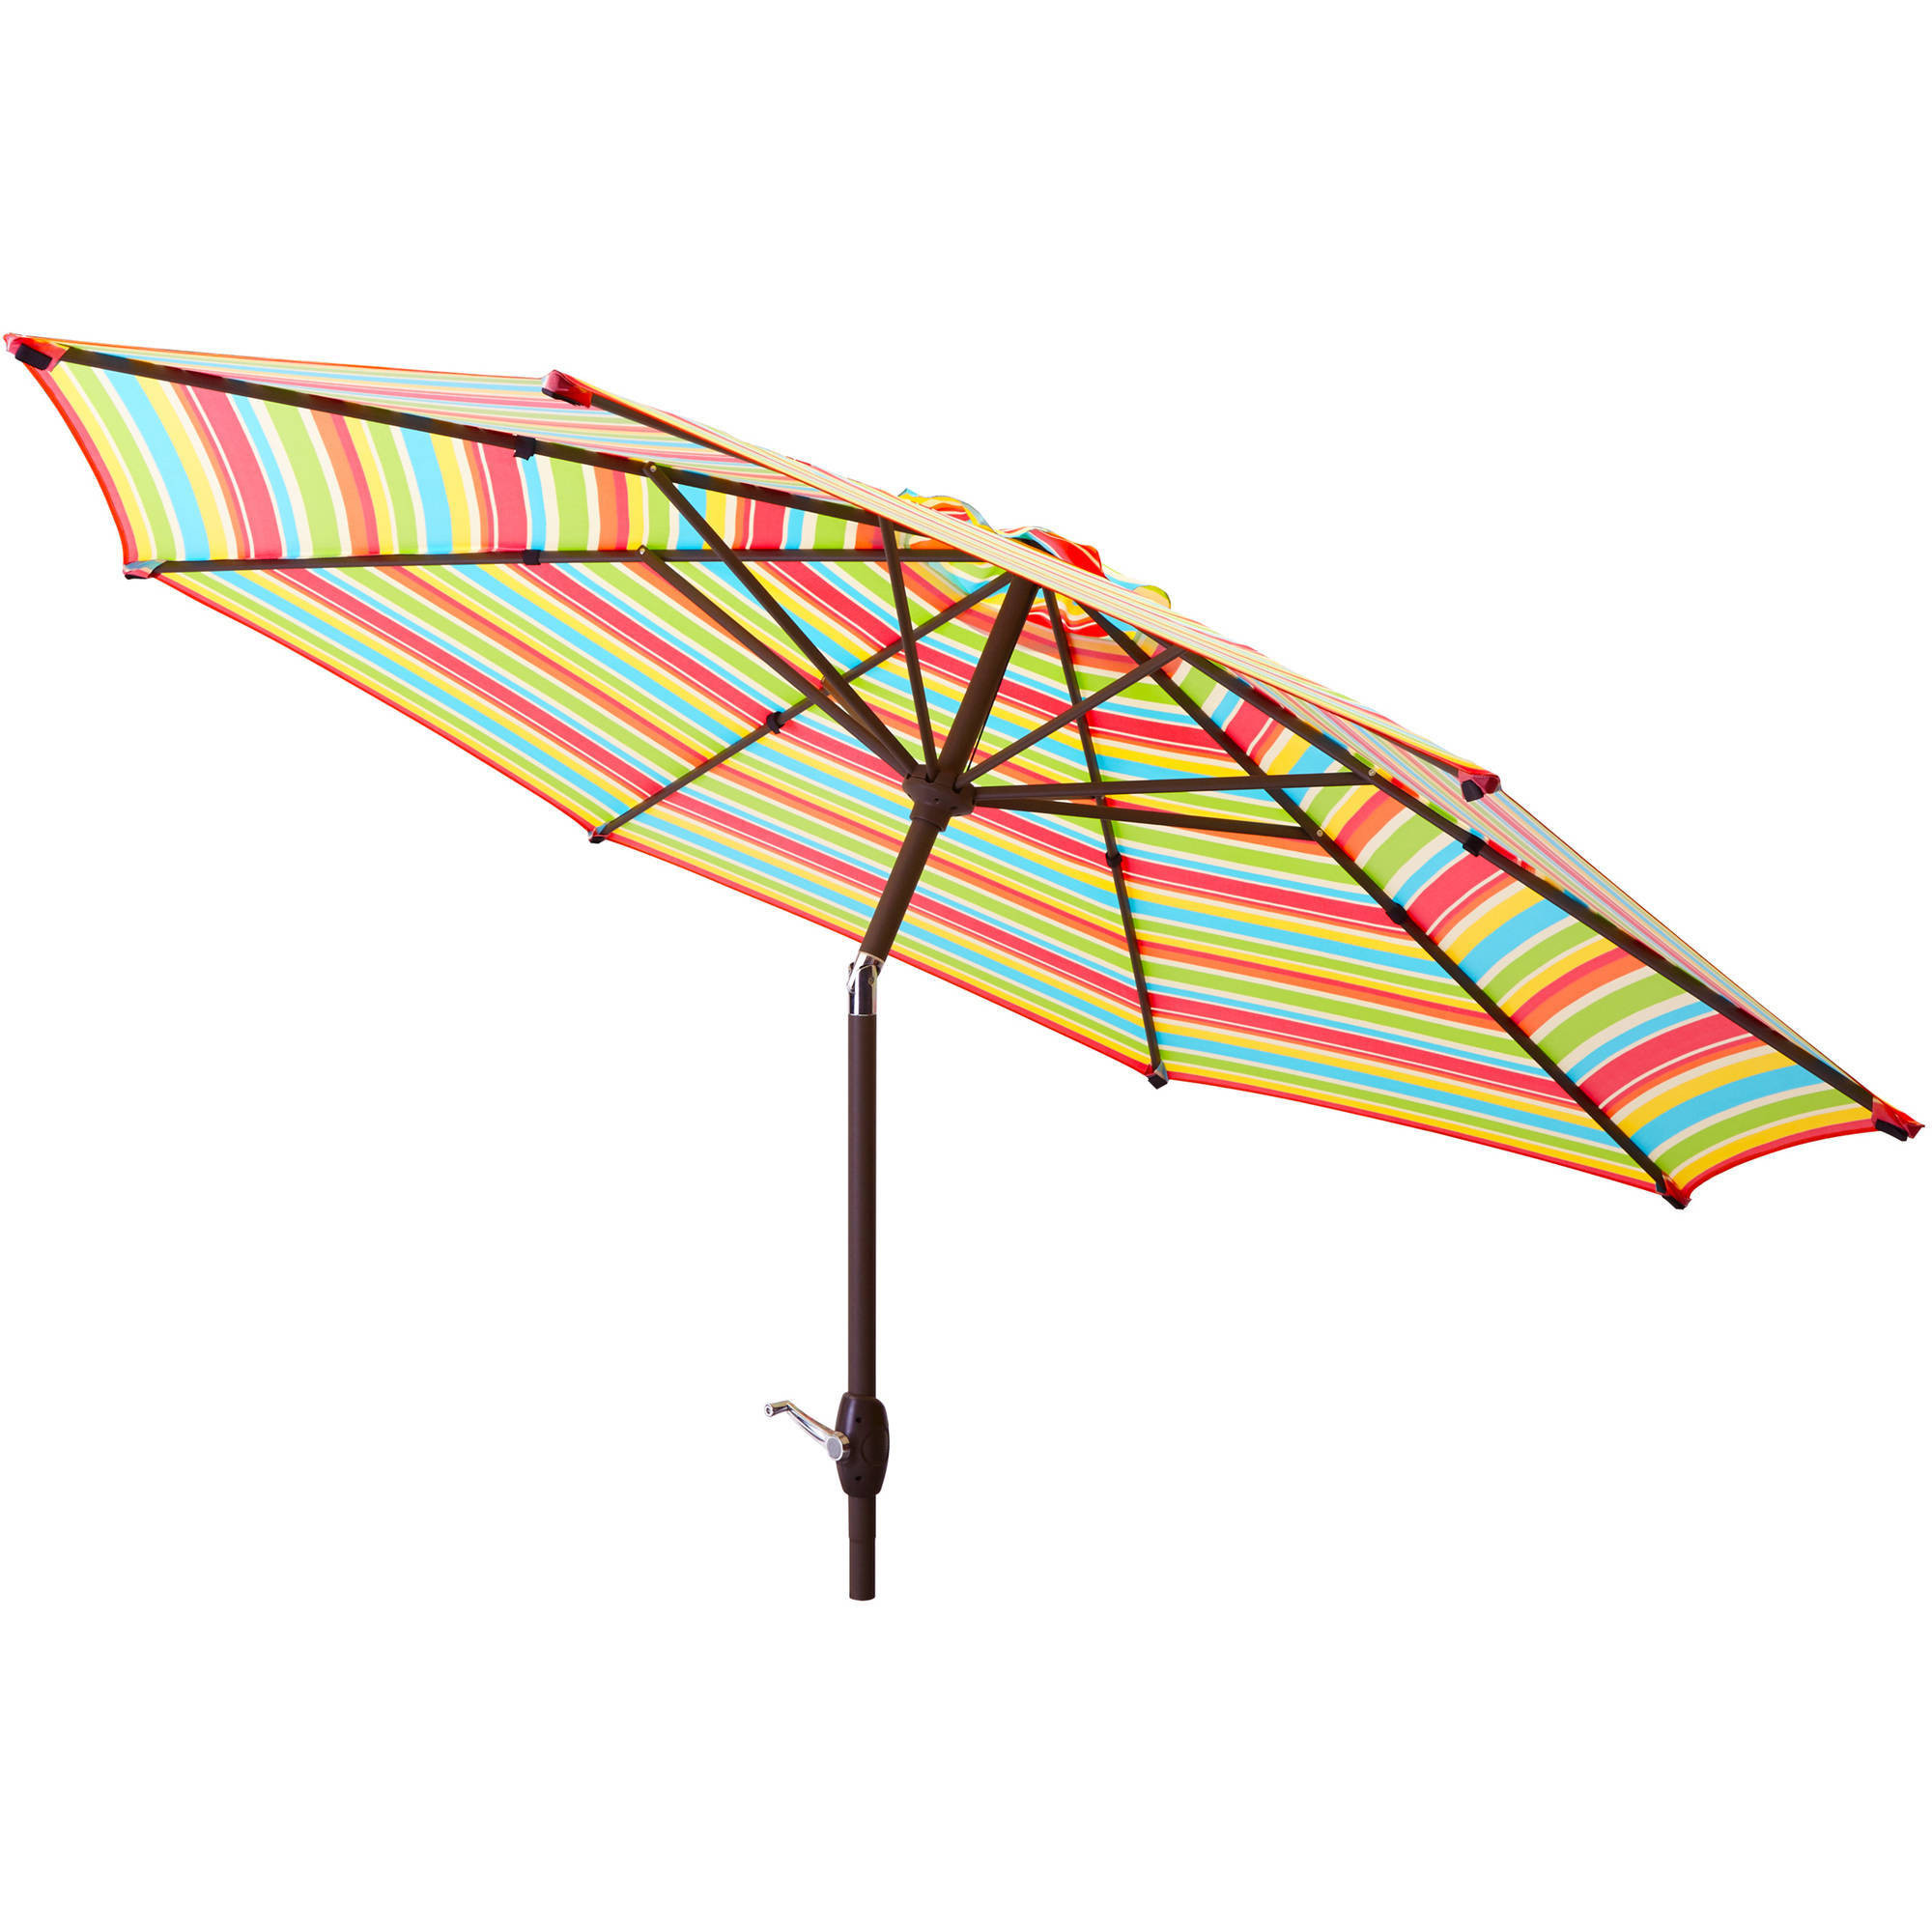 Best ideas about Patio Umbrella Walmart . Save or Pin Patio Umbrella 9 Aluminum Patio Market Umbrella Tilt W Now.